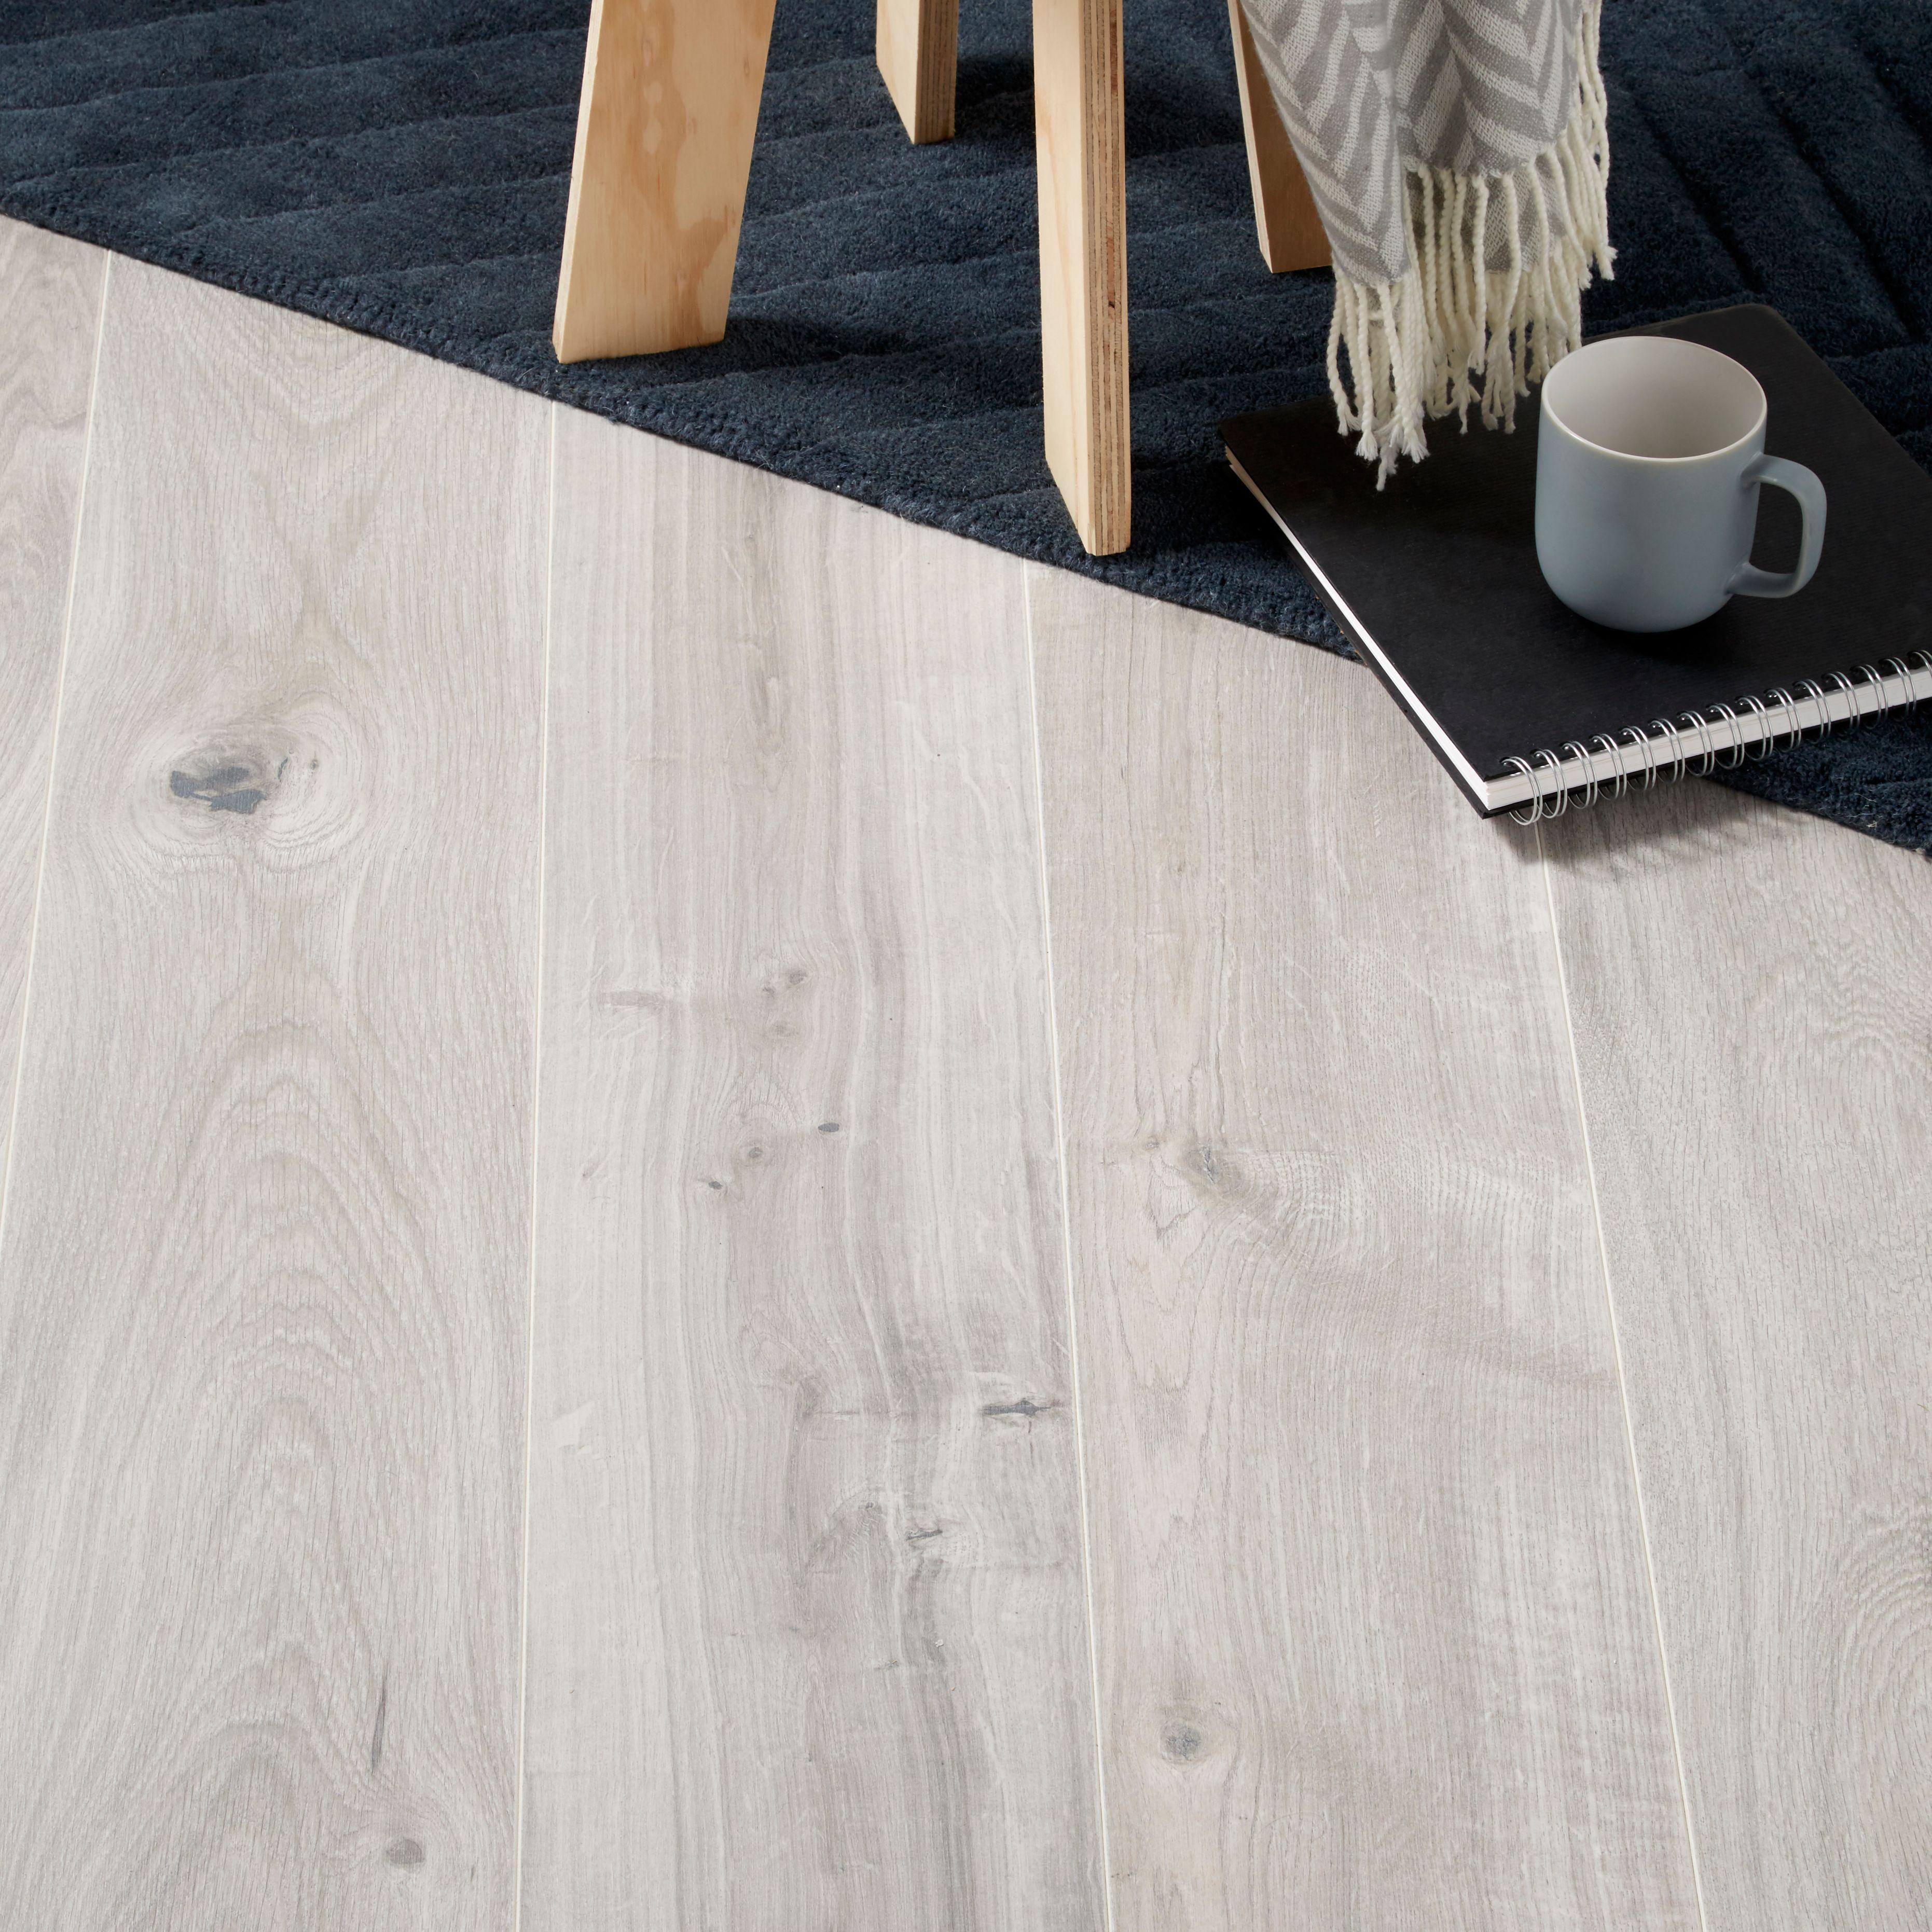 Gladstone Grey Oak Effect Laminate Flooring 1 996 M² Pack Departments Diy At B Q